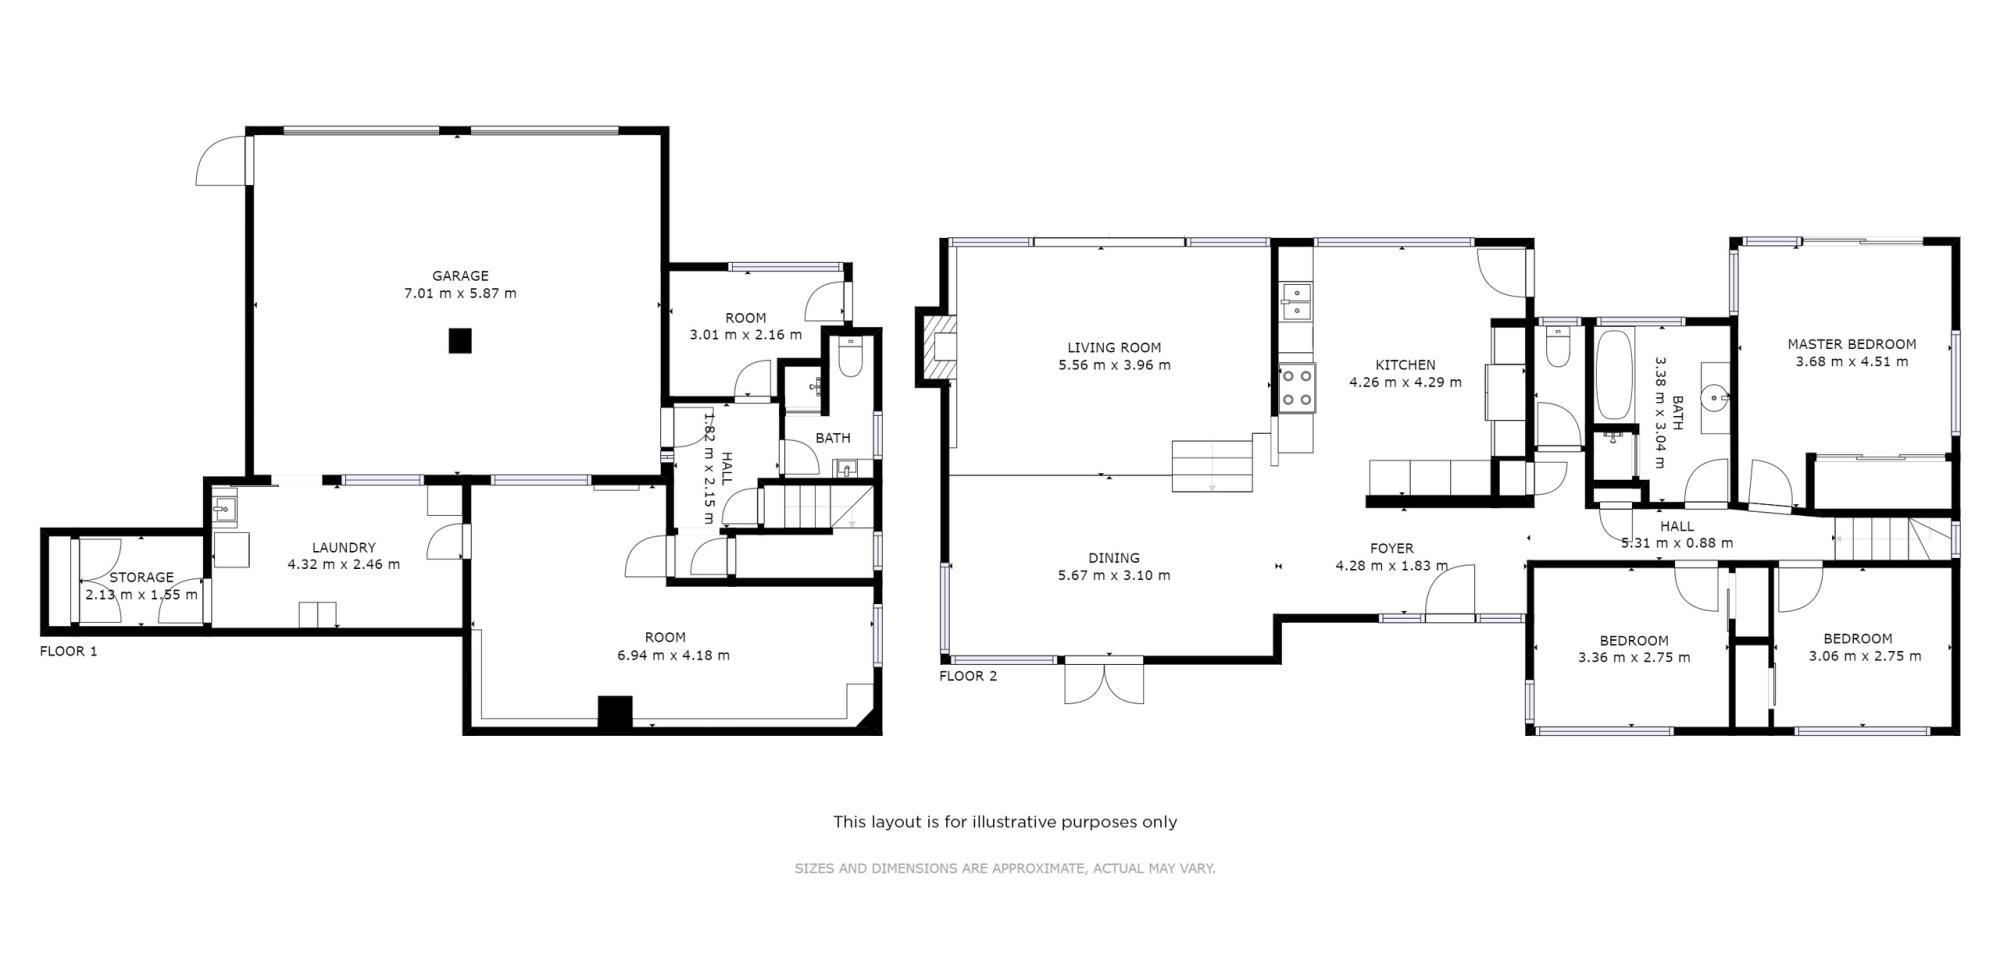 10 Tahuna Place Onerahiproperty floorplan image